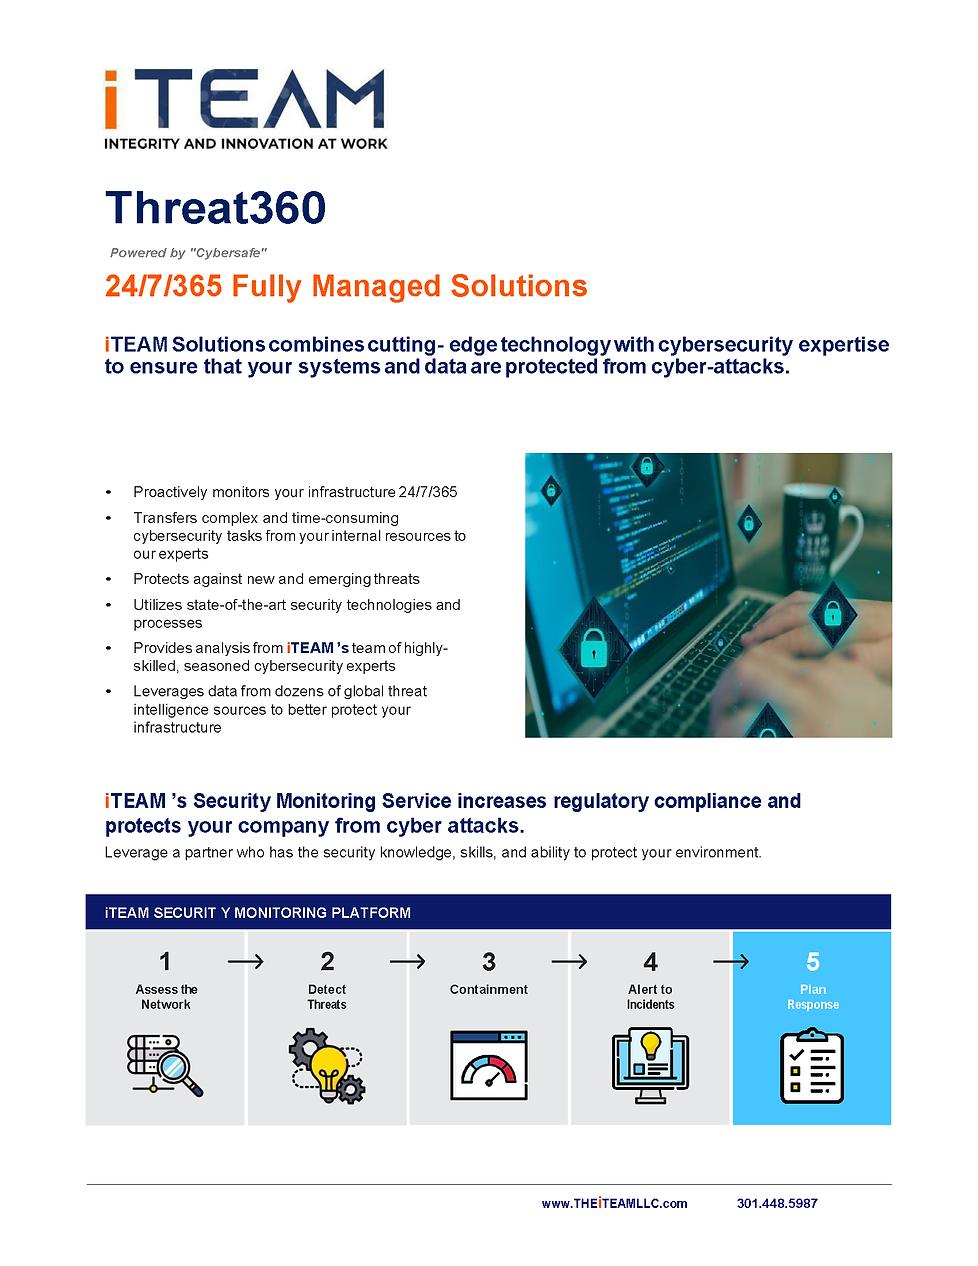 iteam_Threat360-Updated_2021_RJW_Page_1.